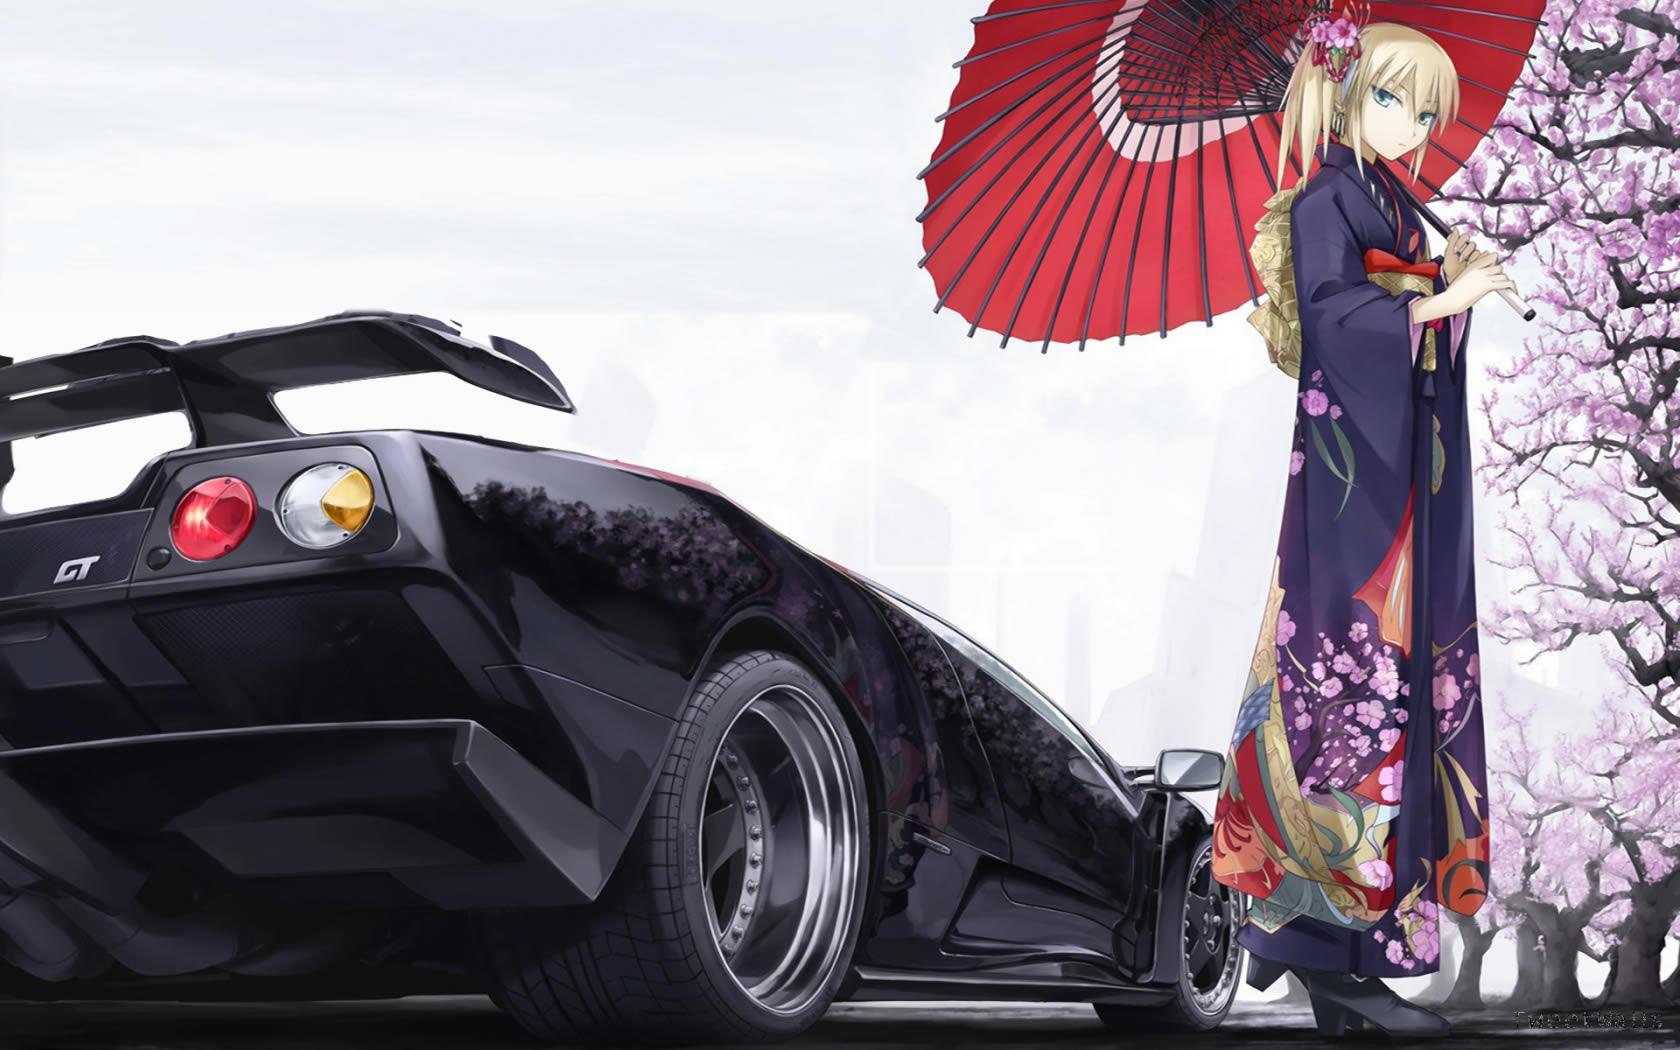 Cool Car And Cute Girl Anime Wallpaper 7305 Wallpaper Wallpaper 1680x1050